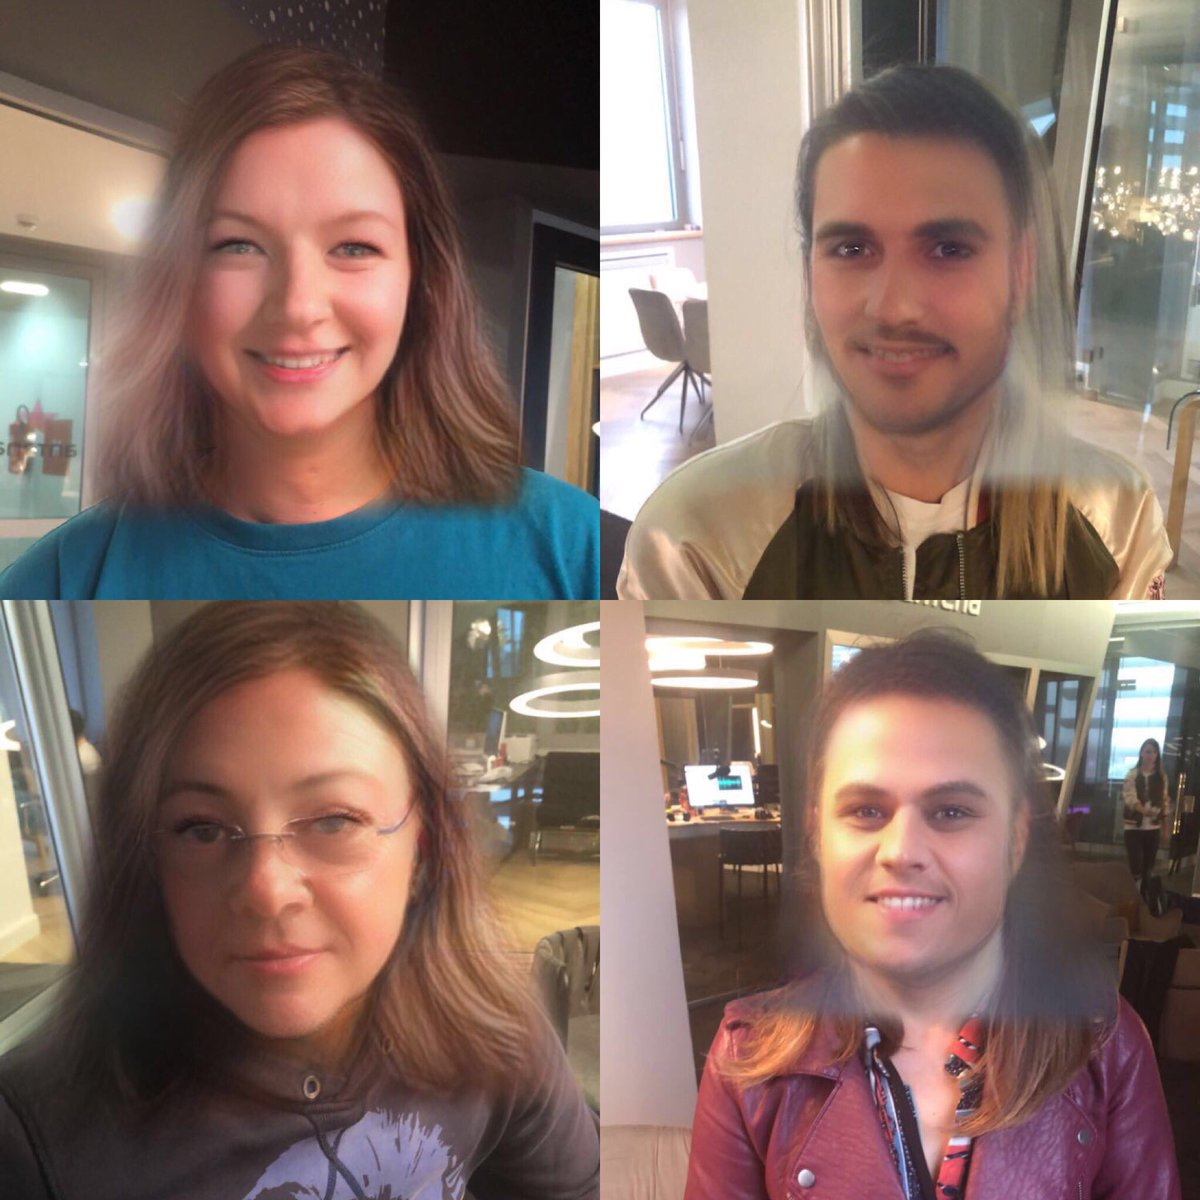 #jutarnjishow isprobao 😱 #snapchat filter 😂😂 pronađi Tamaru Loos? Tko je Saša Buneta, a tko @bojan_nema_plan ?! #antena #filter #photo